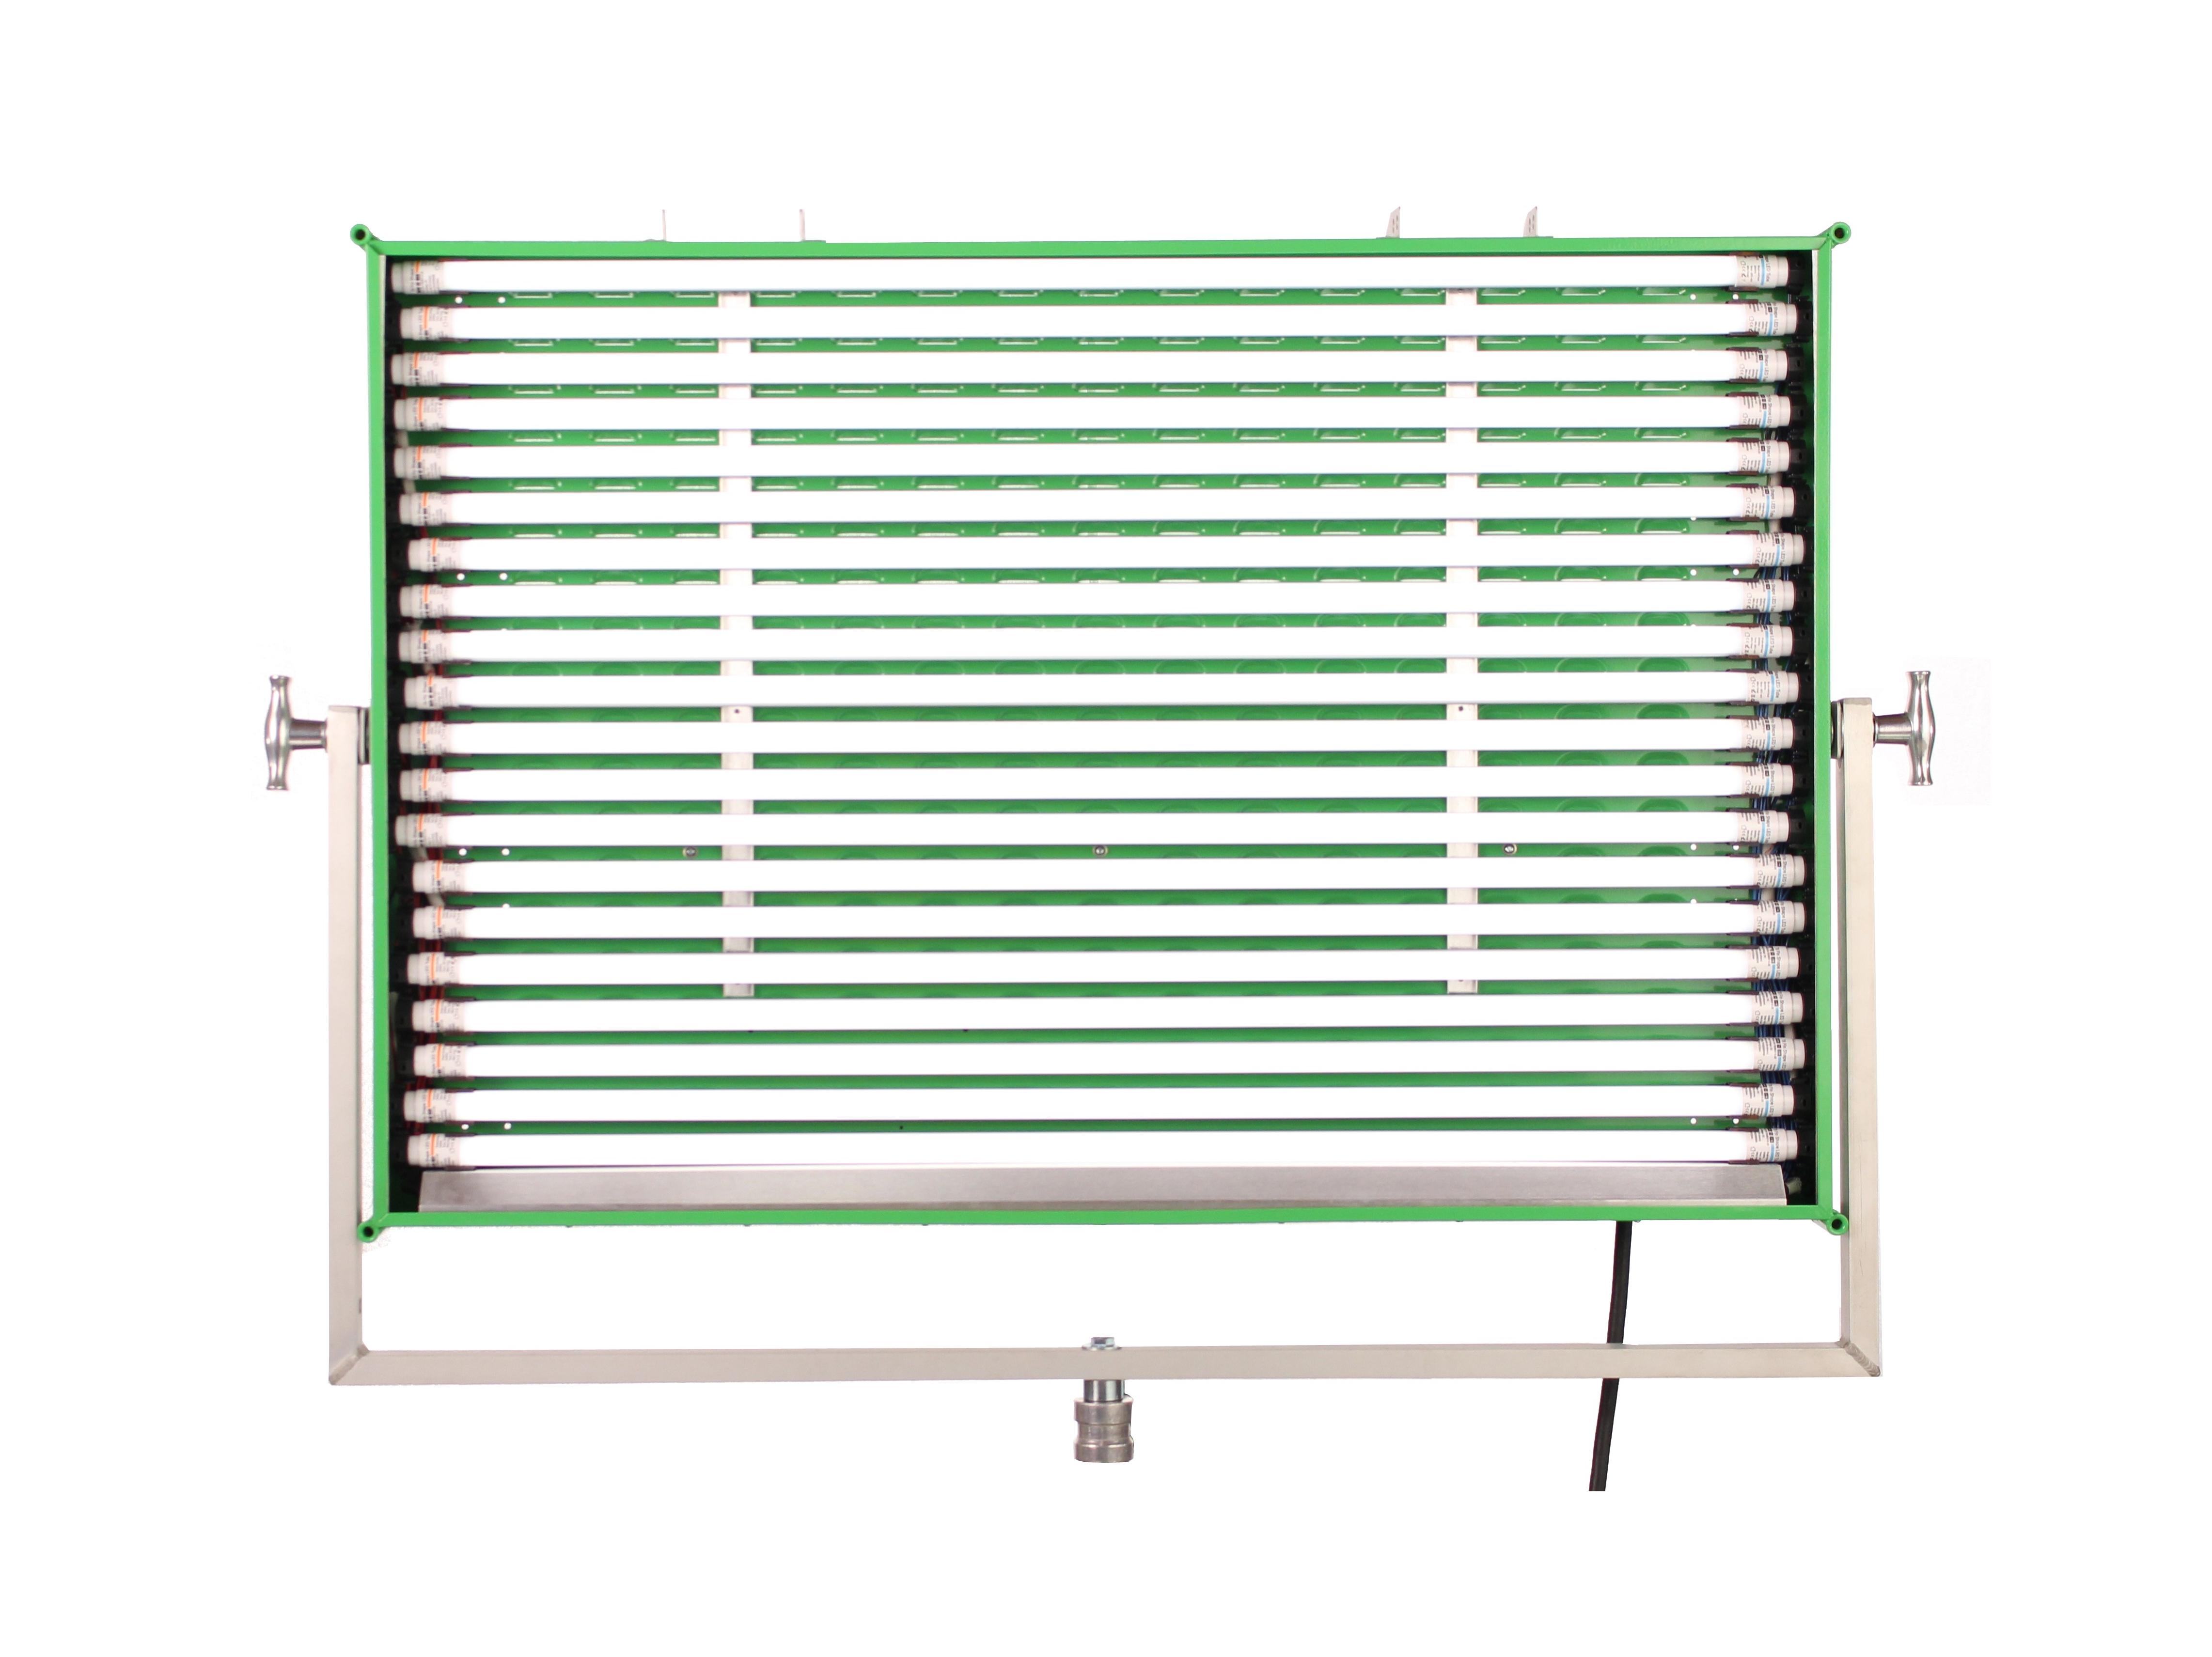 3x4 20-Lite Led Image